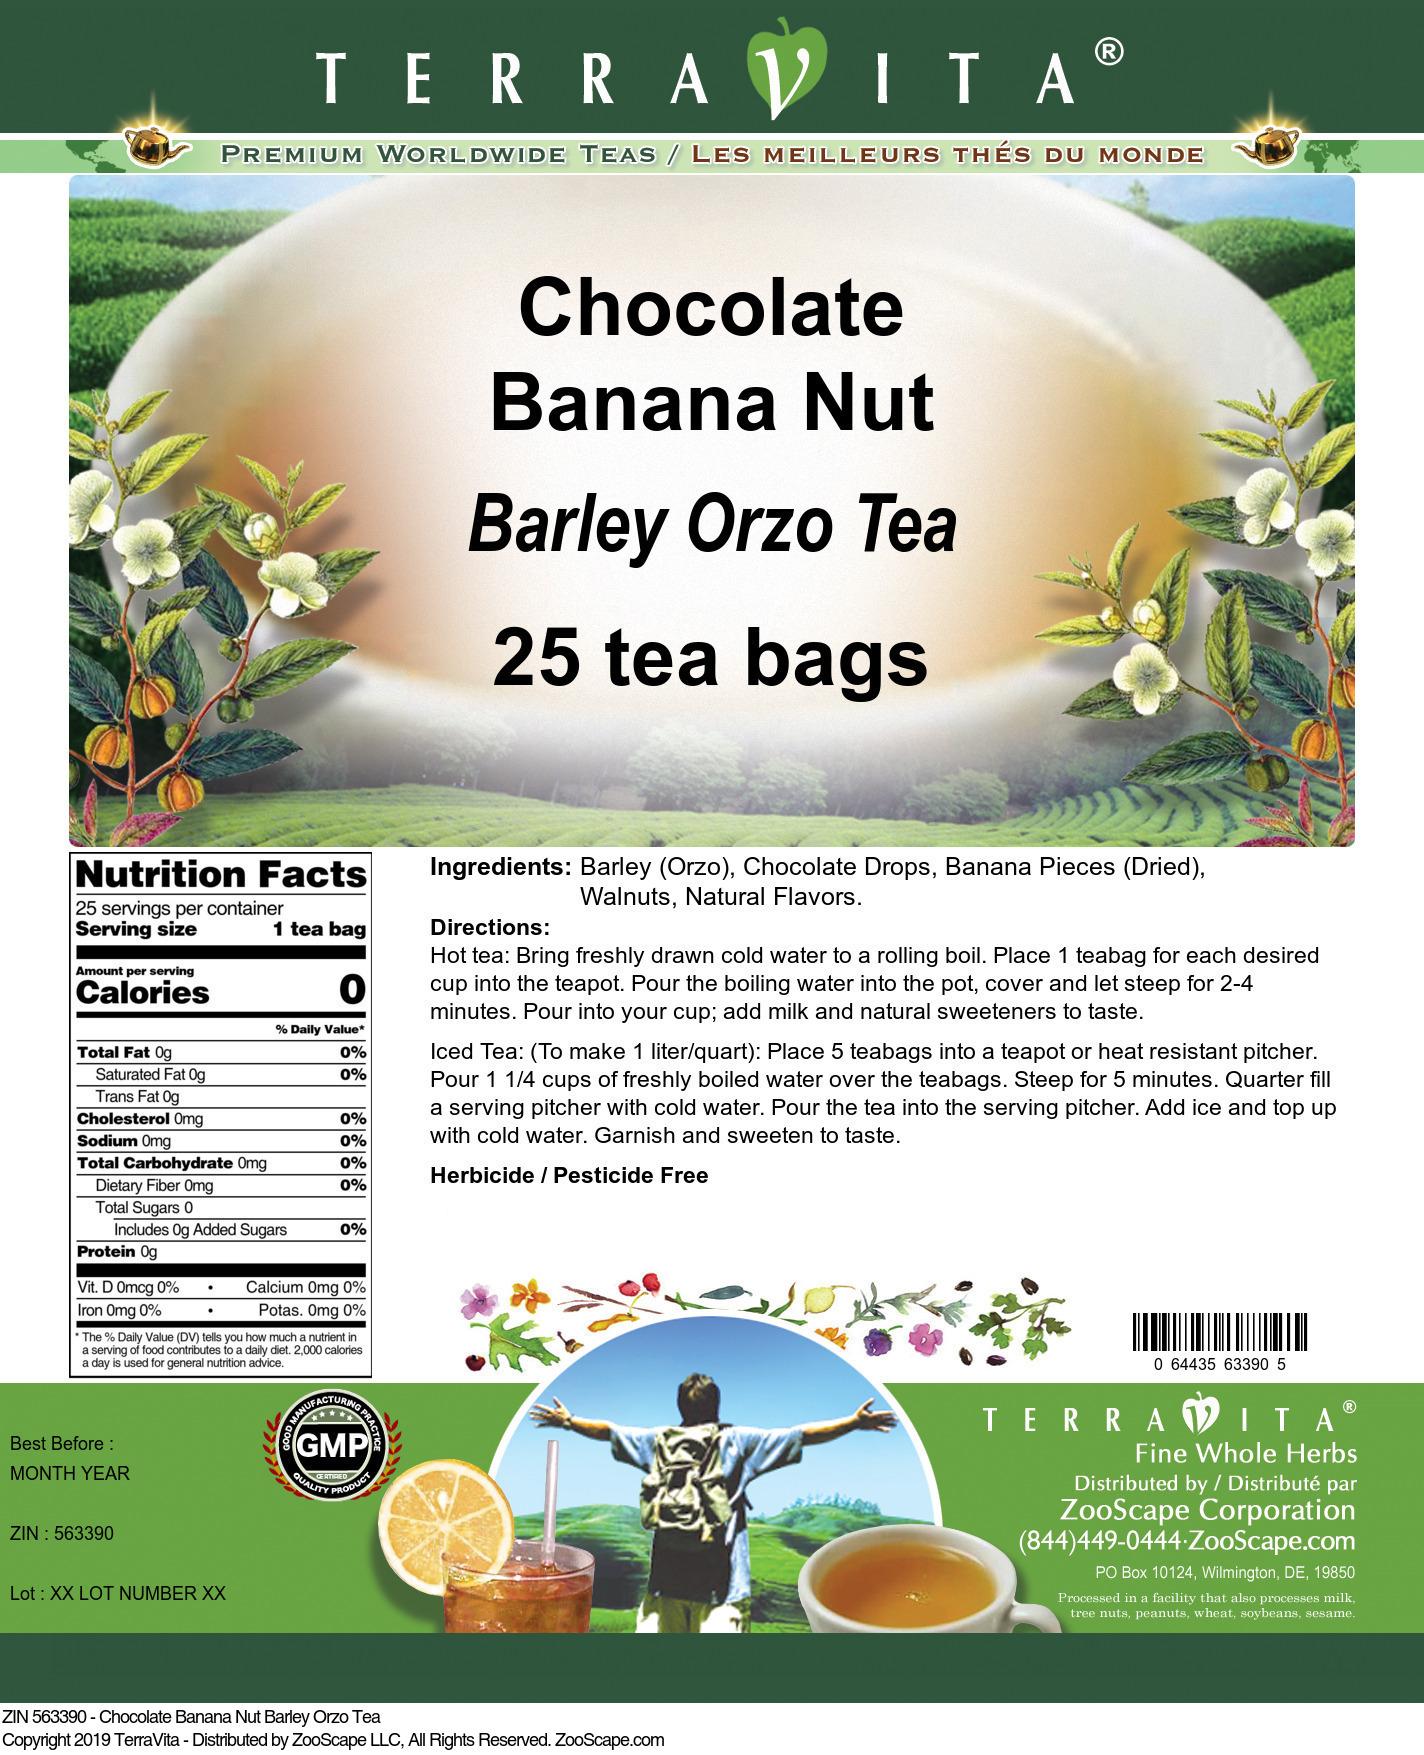 Chocolate Banana Nut Barley Orzo